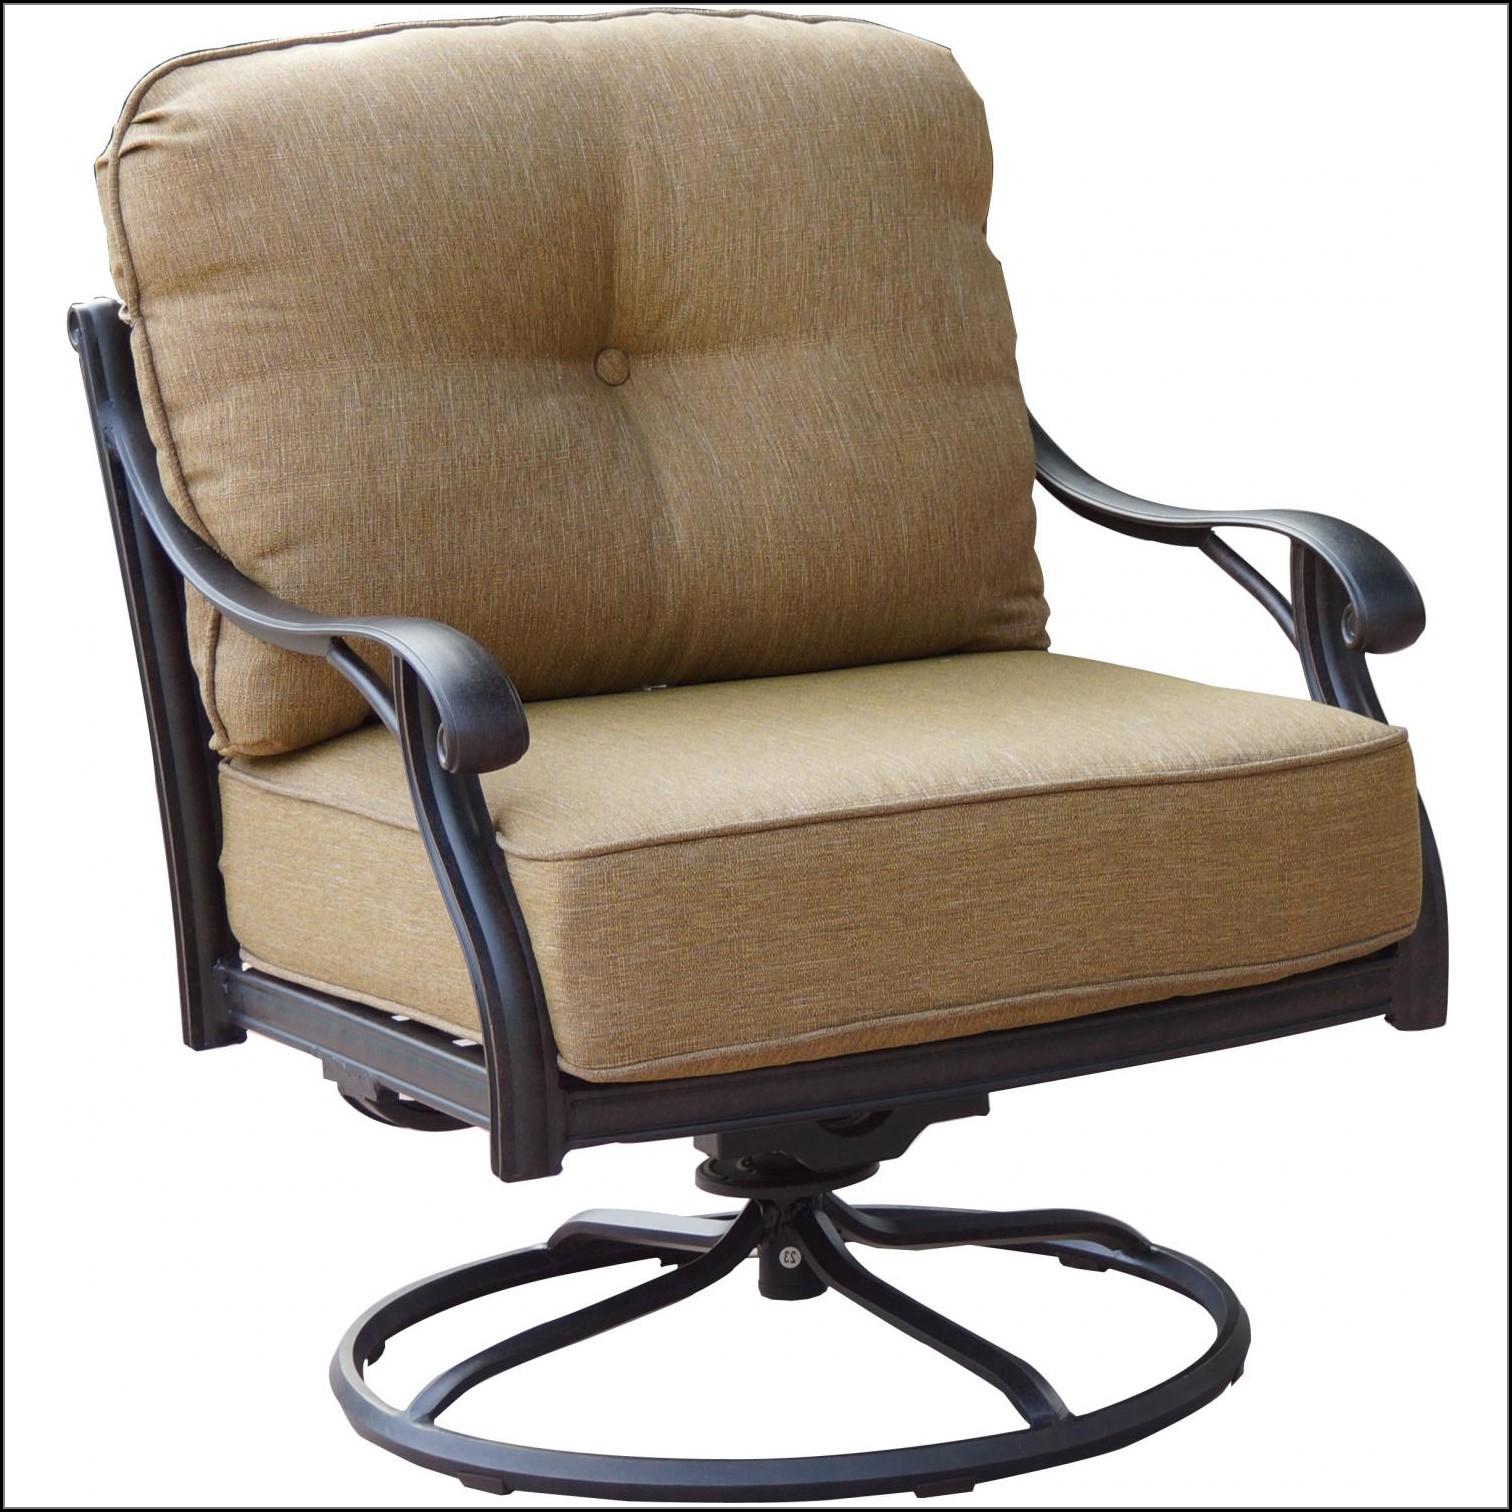 Aluminum Swivel Rocker Patio Chairs